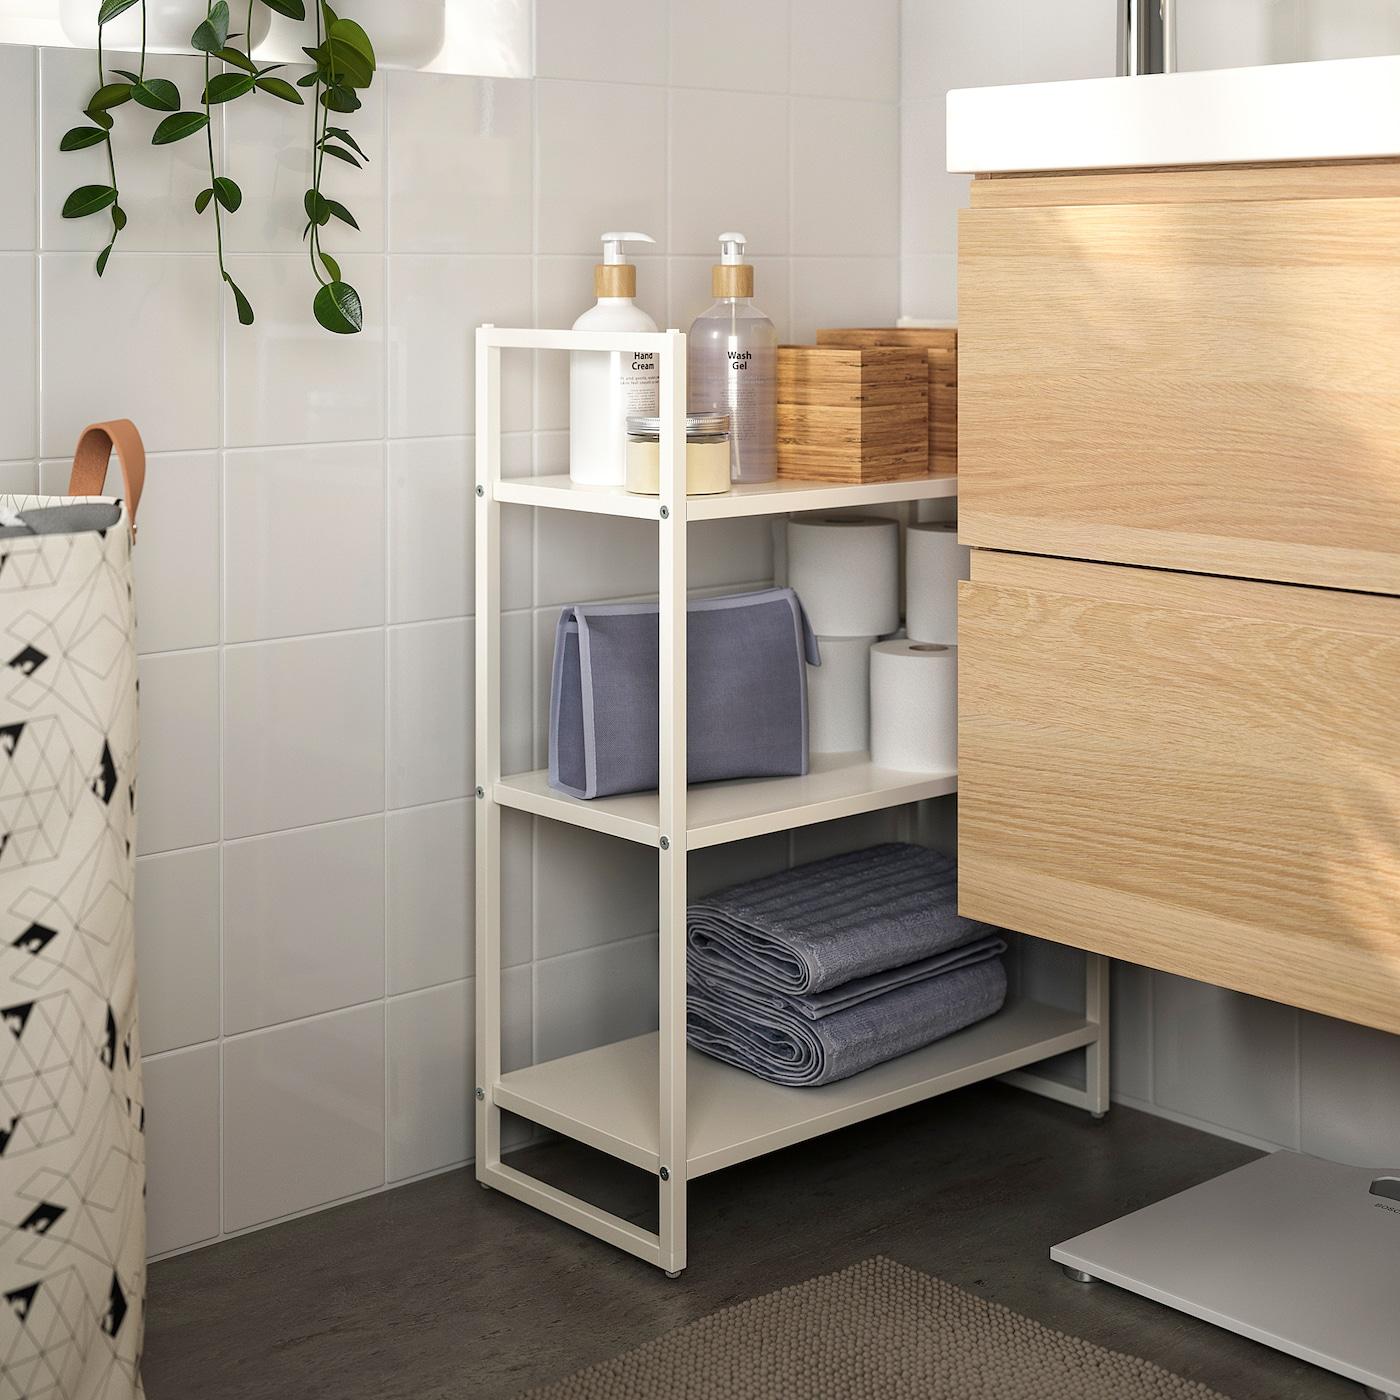 Jonaxel Reol Hvid 25x51x70 Cm Ikea